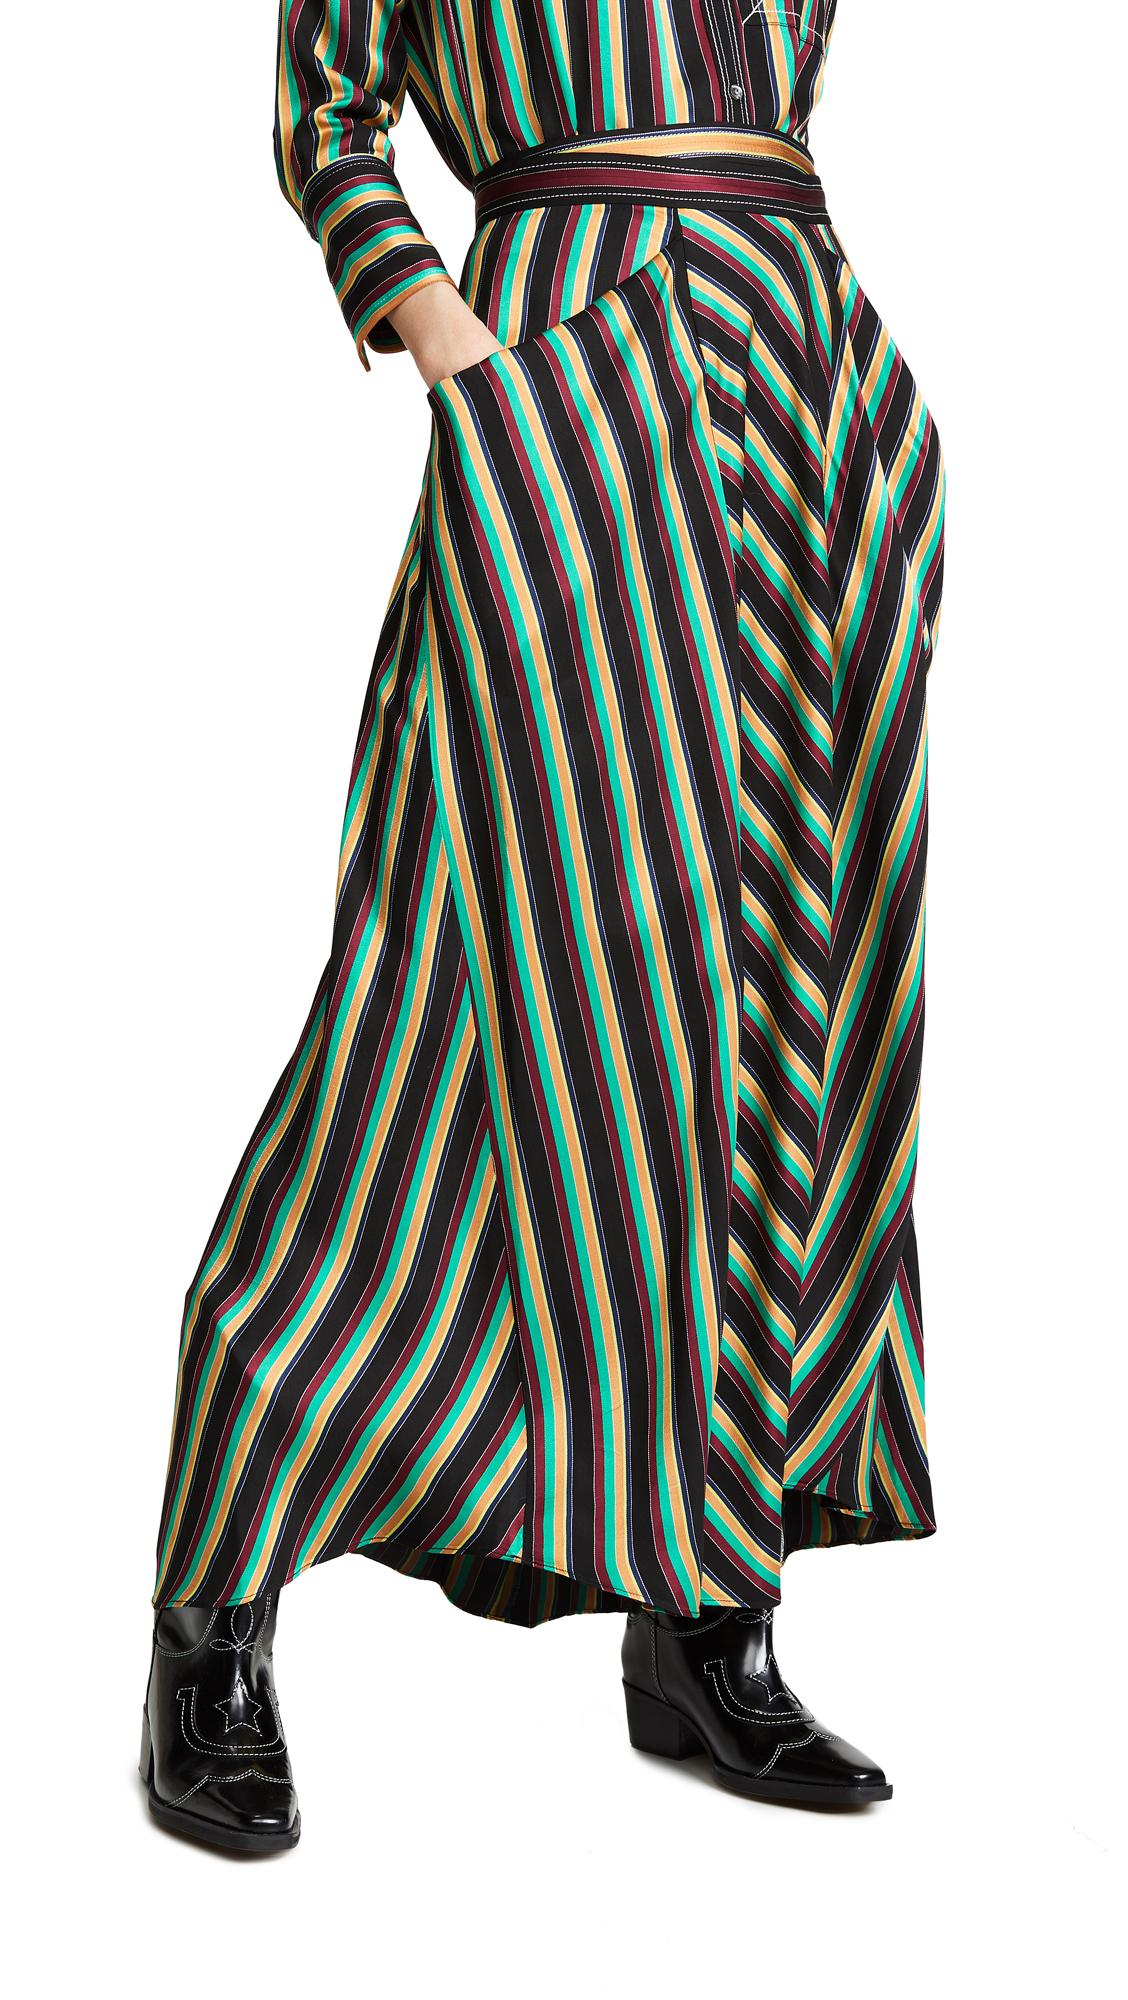 3.1 Phillip Lim Striped Maxi Skirt - Black Multi Stripe